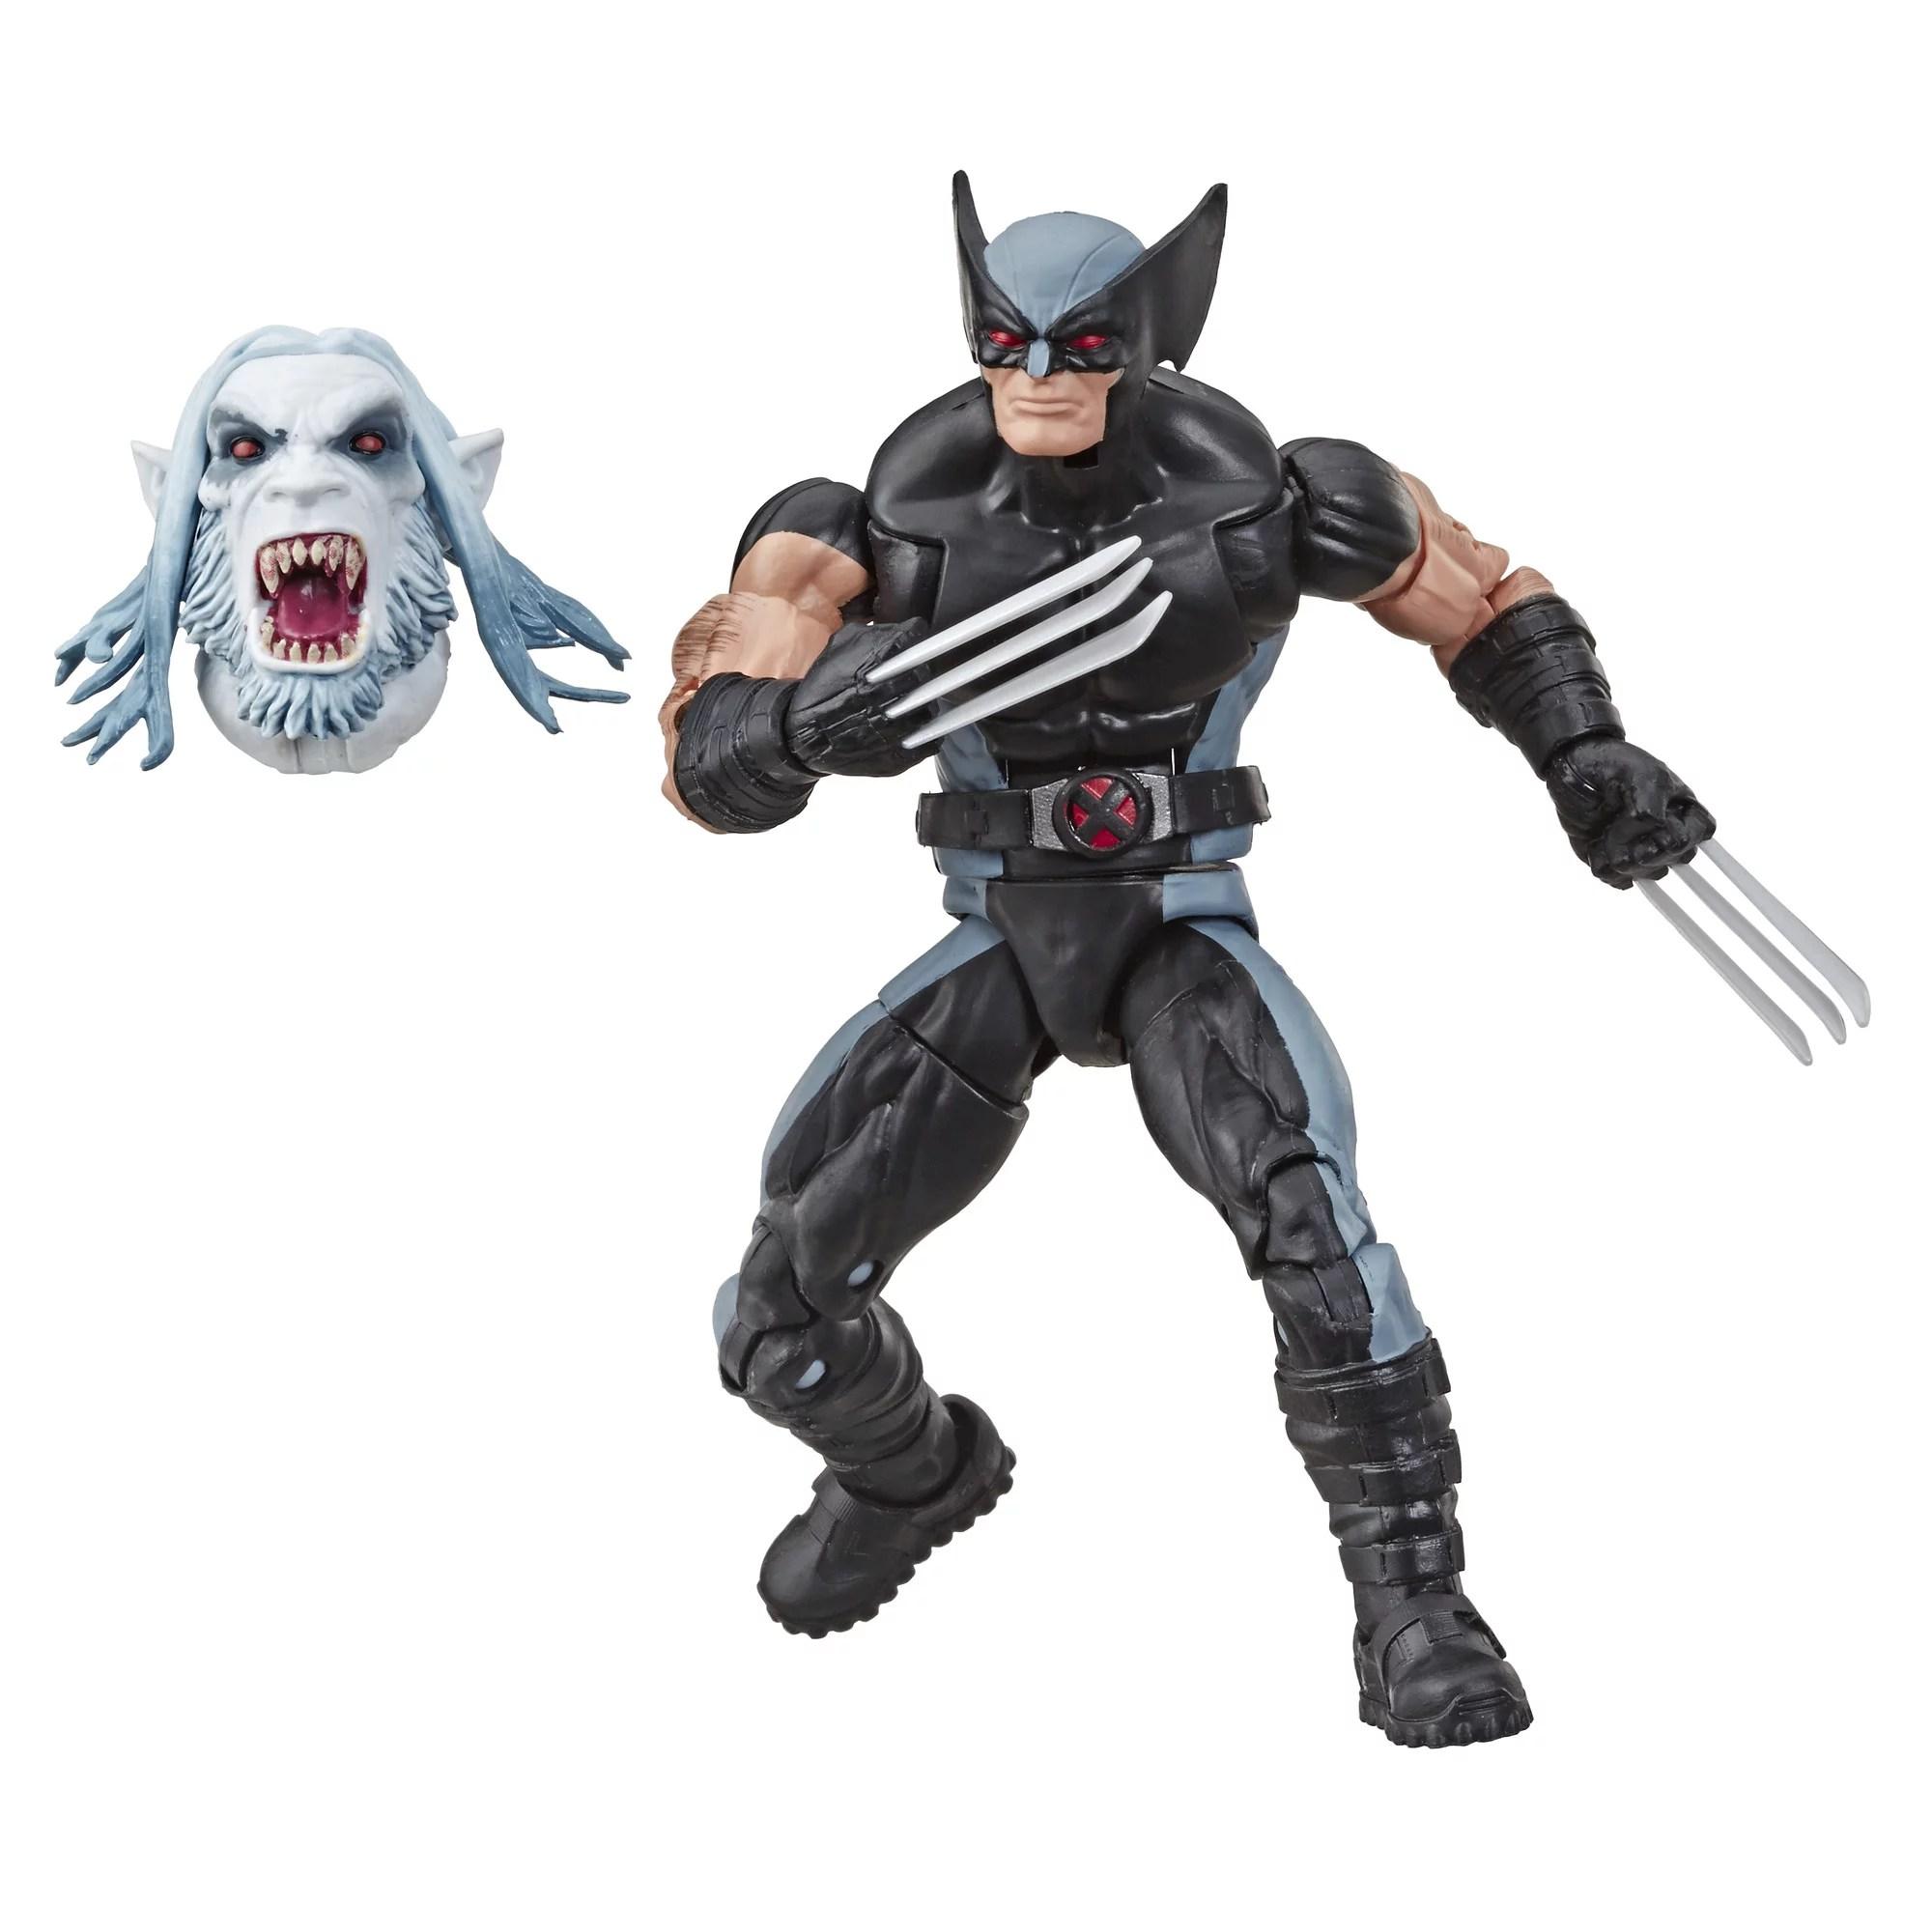 Hasbro Marvel Legends Series 6 Collectible Action Figure Wolverine Toy Walmart Com Walmart Com